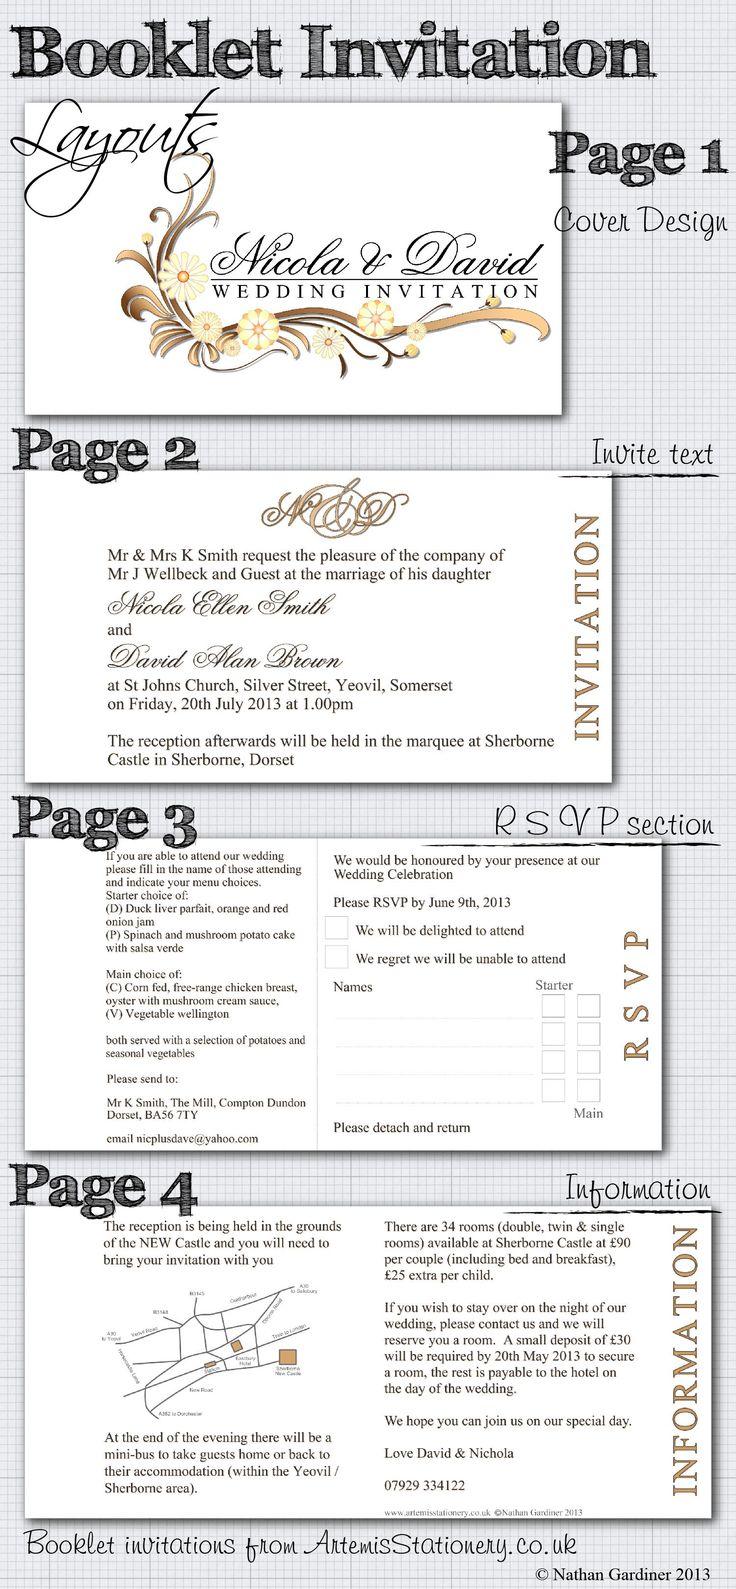 booklet wedding invitation layout wedding ideas pinterest